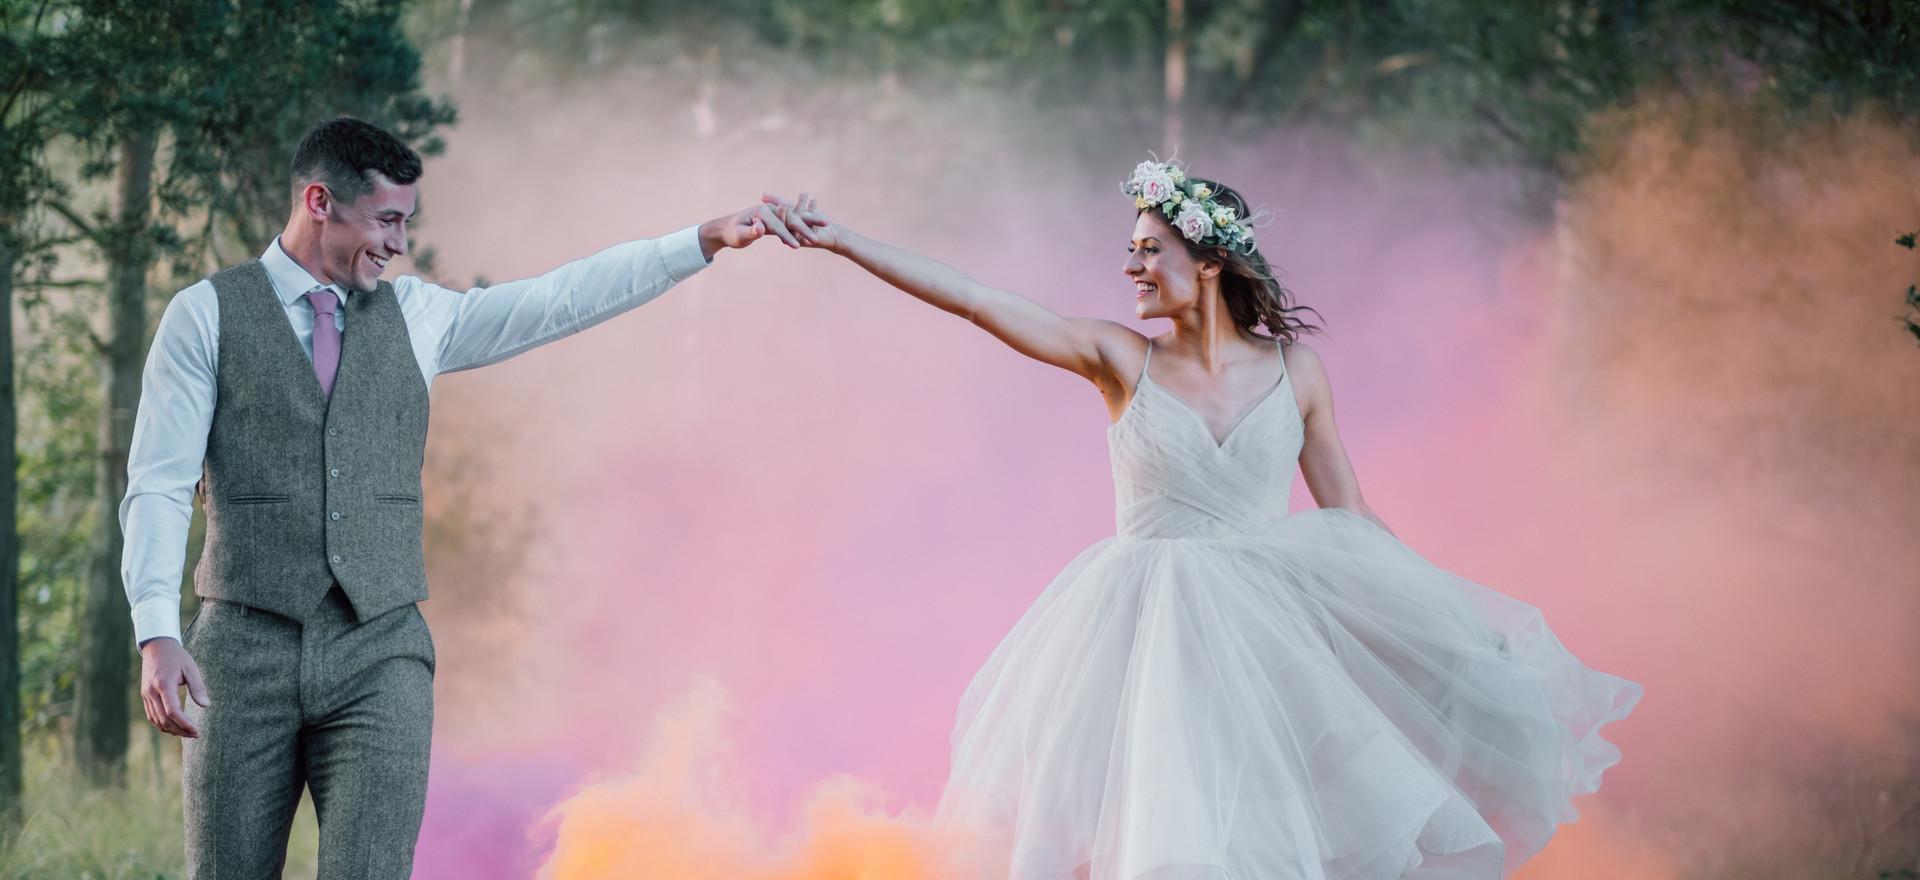 453 Lee Glasgow Wedding Photographer.jpg